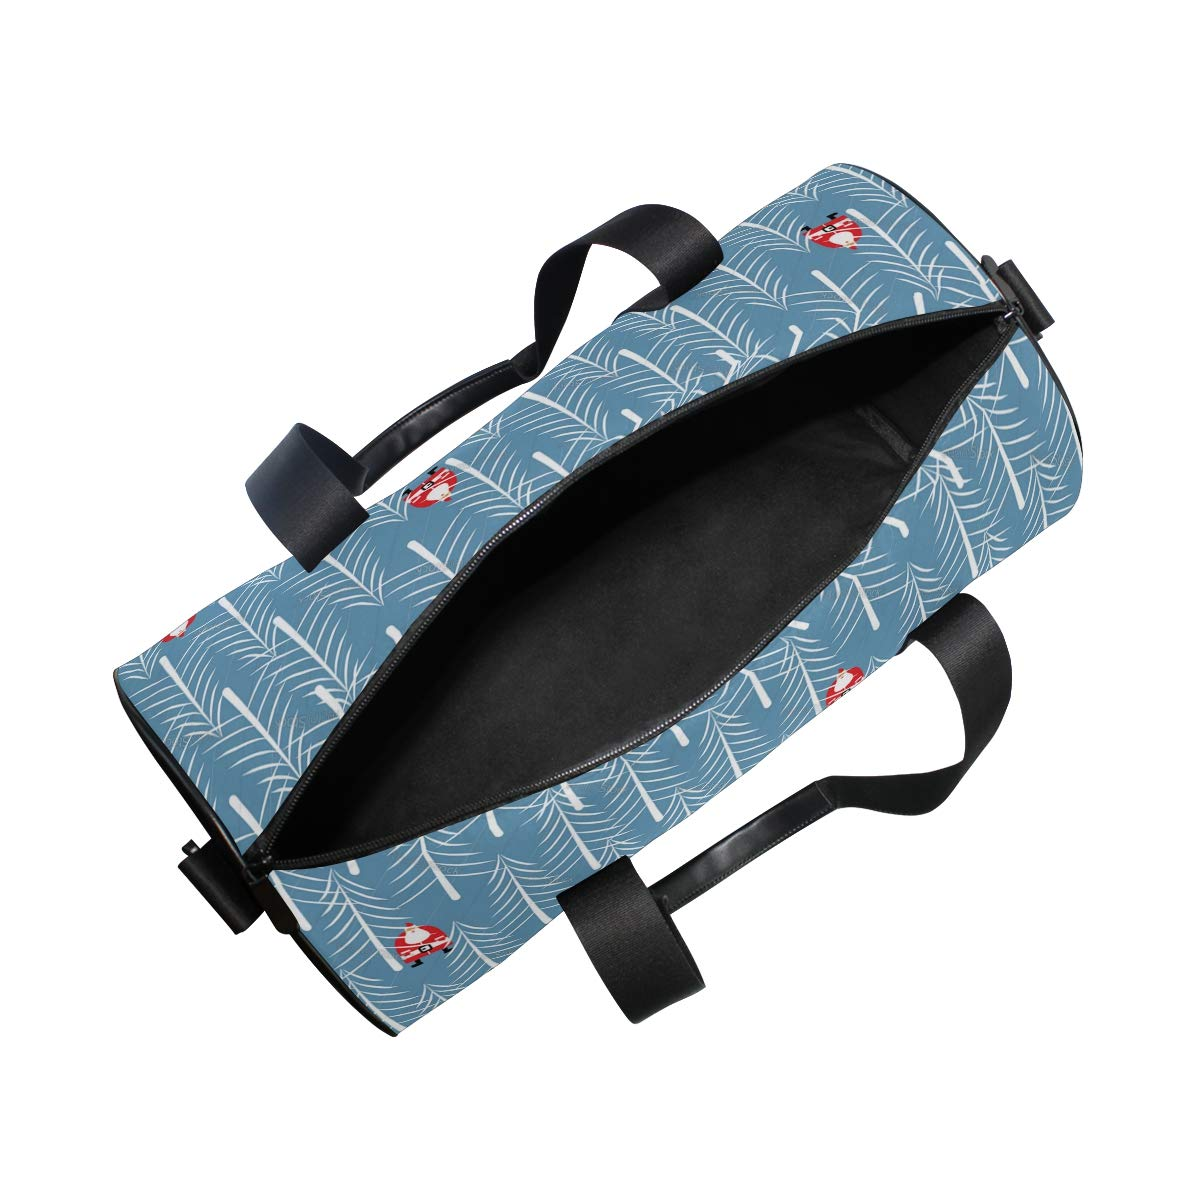 Waterproof Shoulder Bag. Santa Looking For Christmas Tree Popular casual fitness bag,Non-Slip Wearable Crossbody Bag